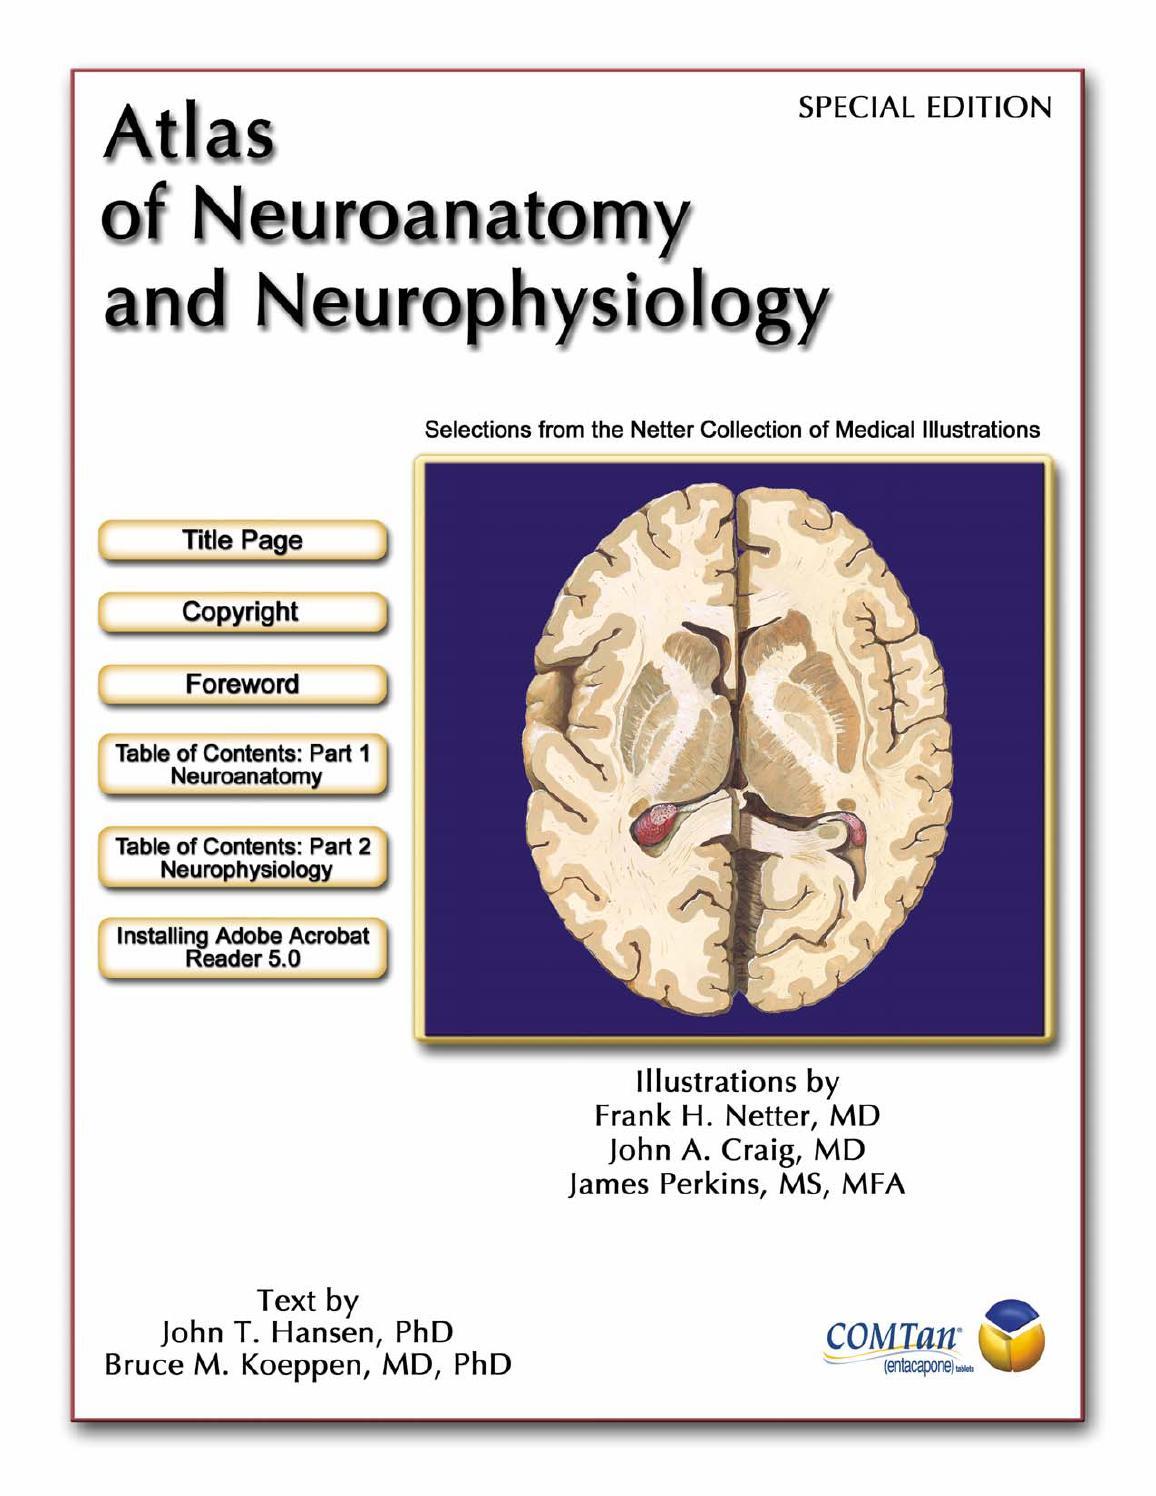 Atlas of neuroanatomy and neurophysiology frank h netter by ...